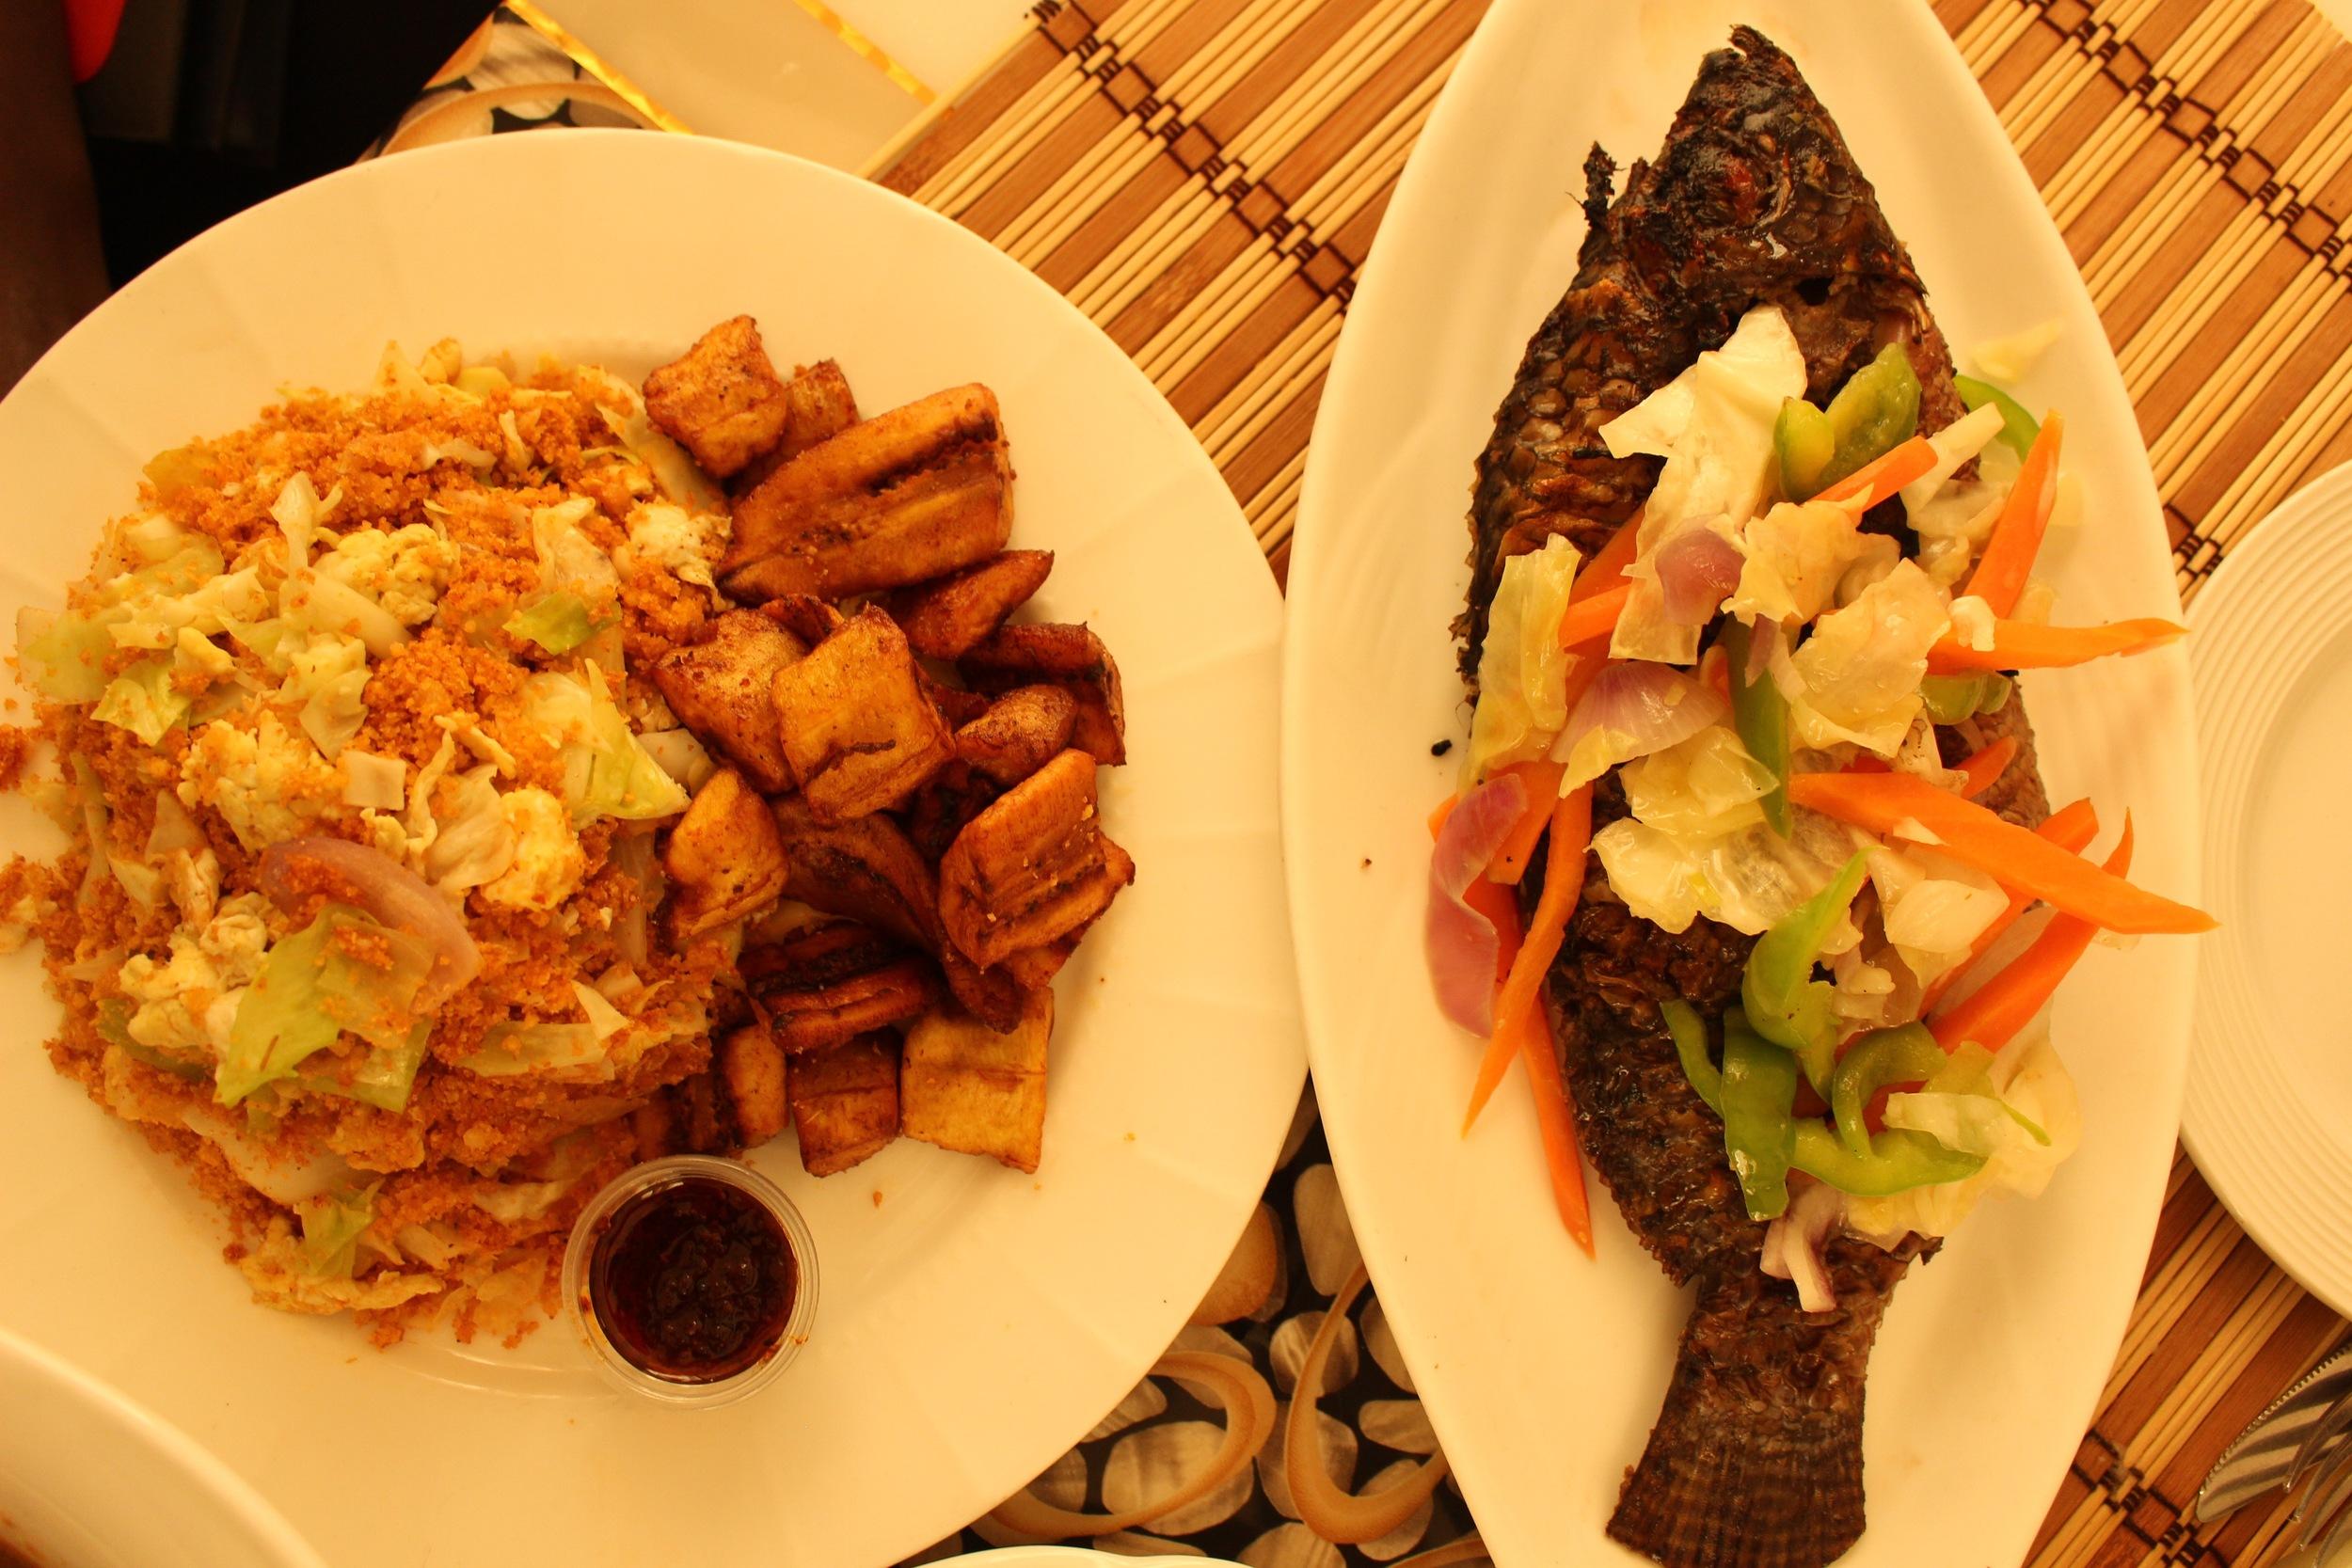 Gari Foto and Grilled Tilapia, Mazera